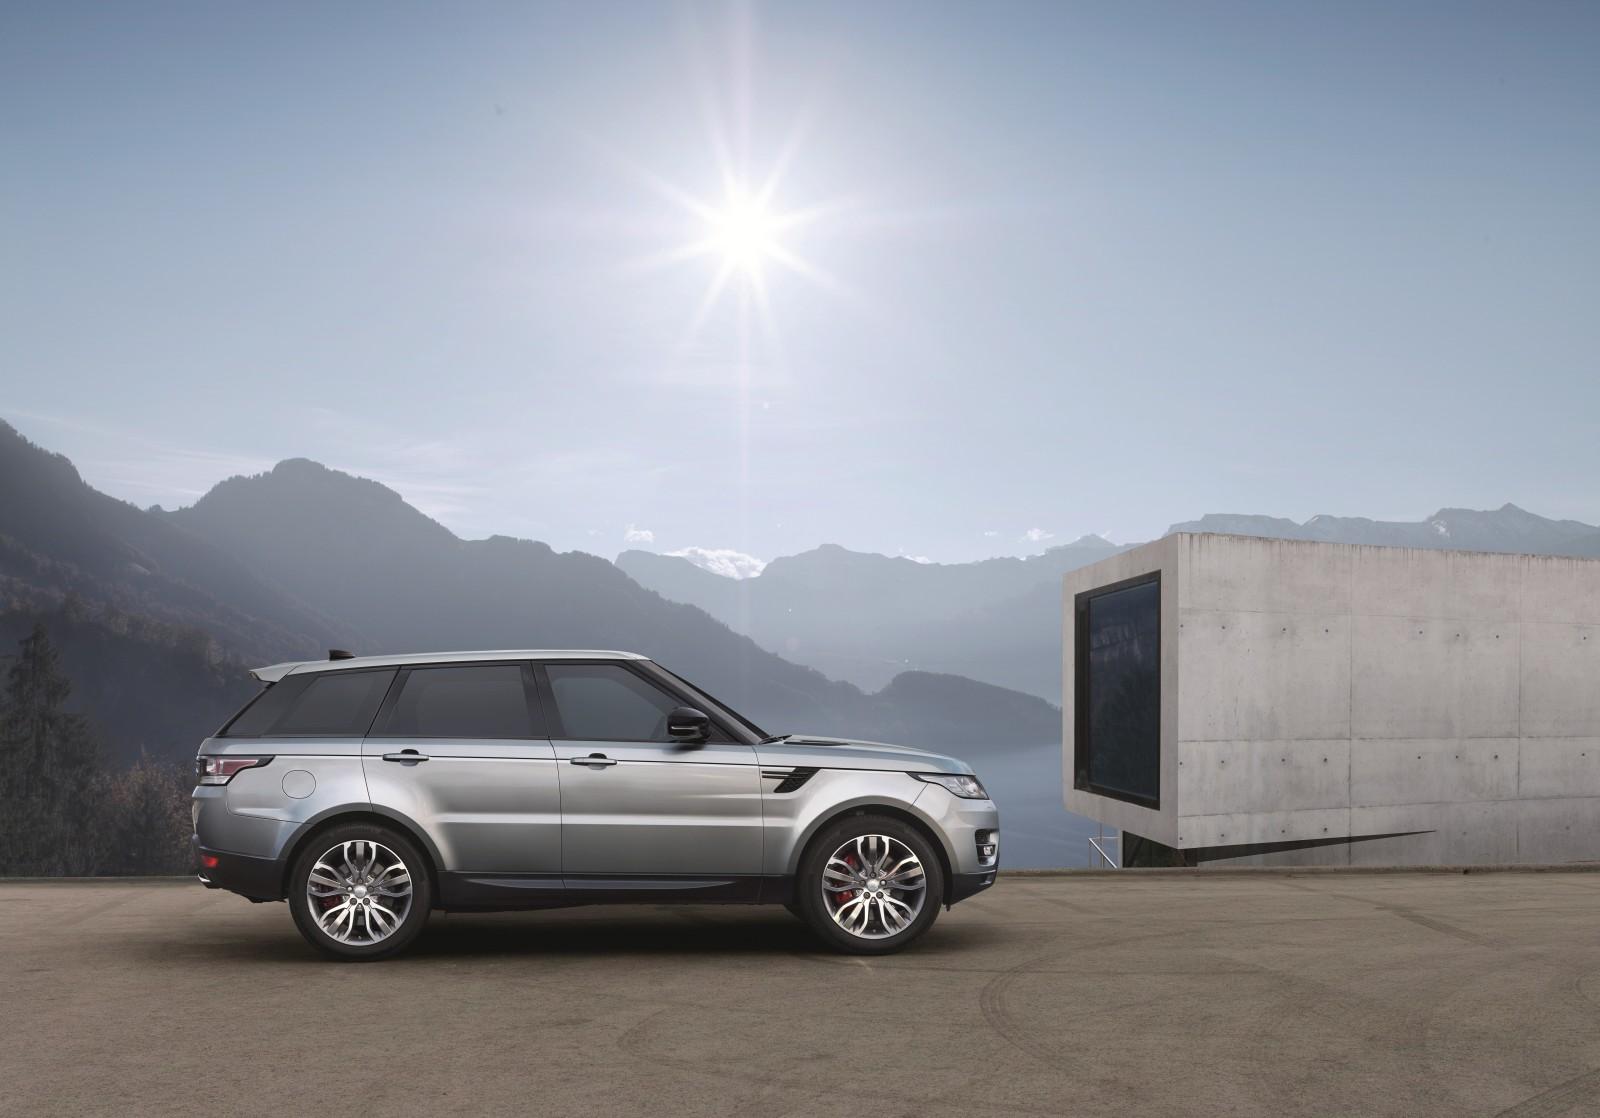 2017 Range Rover Sport exterior (4)